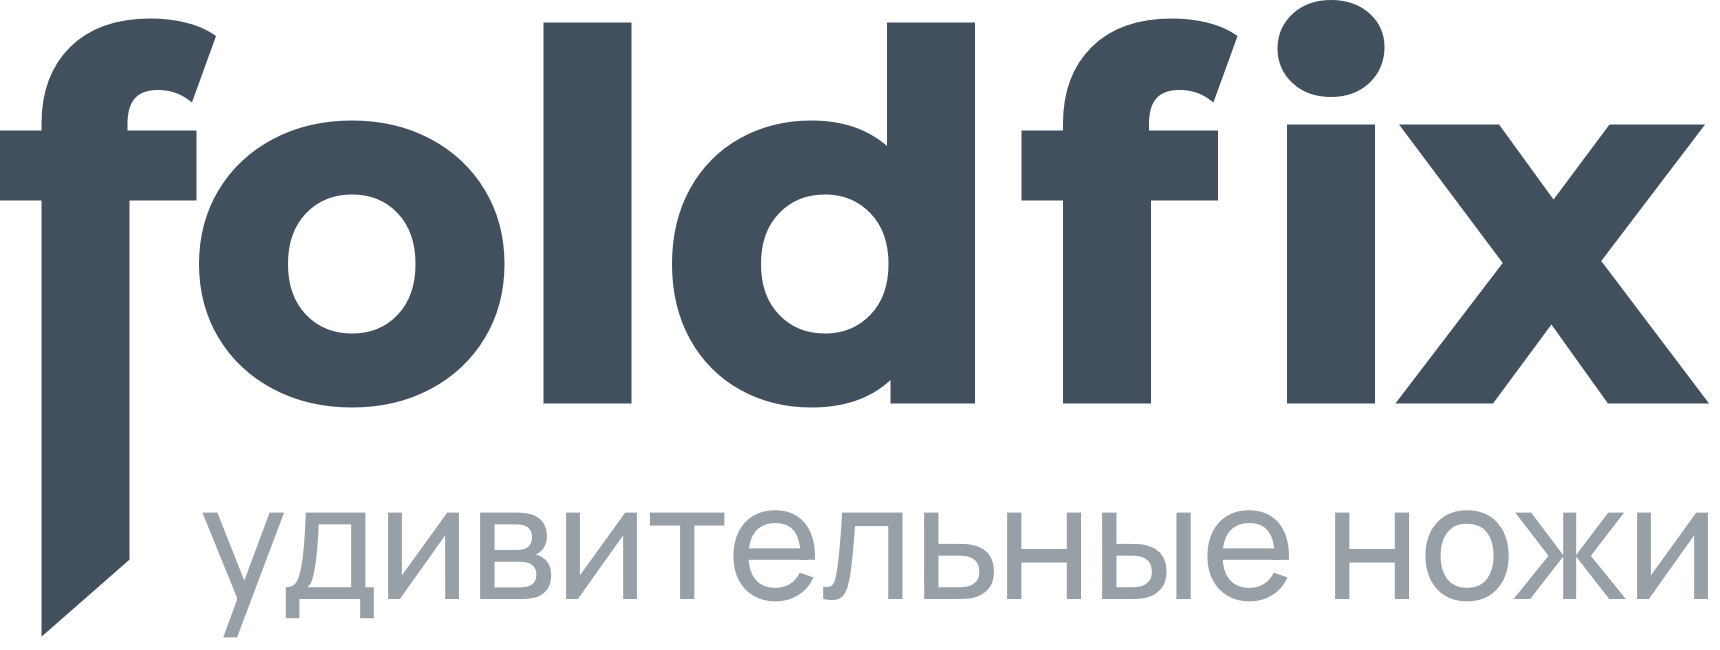 FoldFix